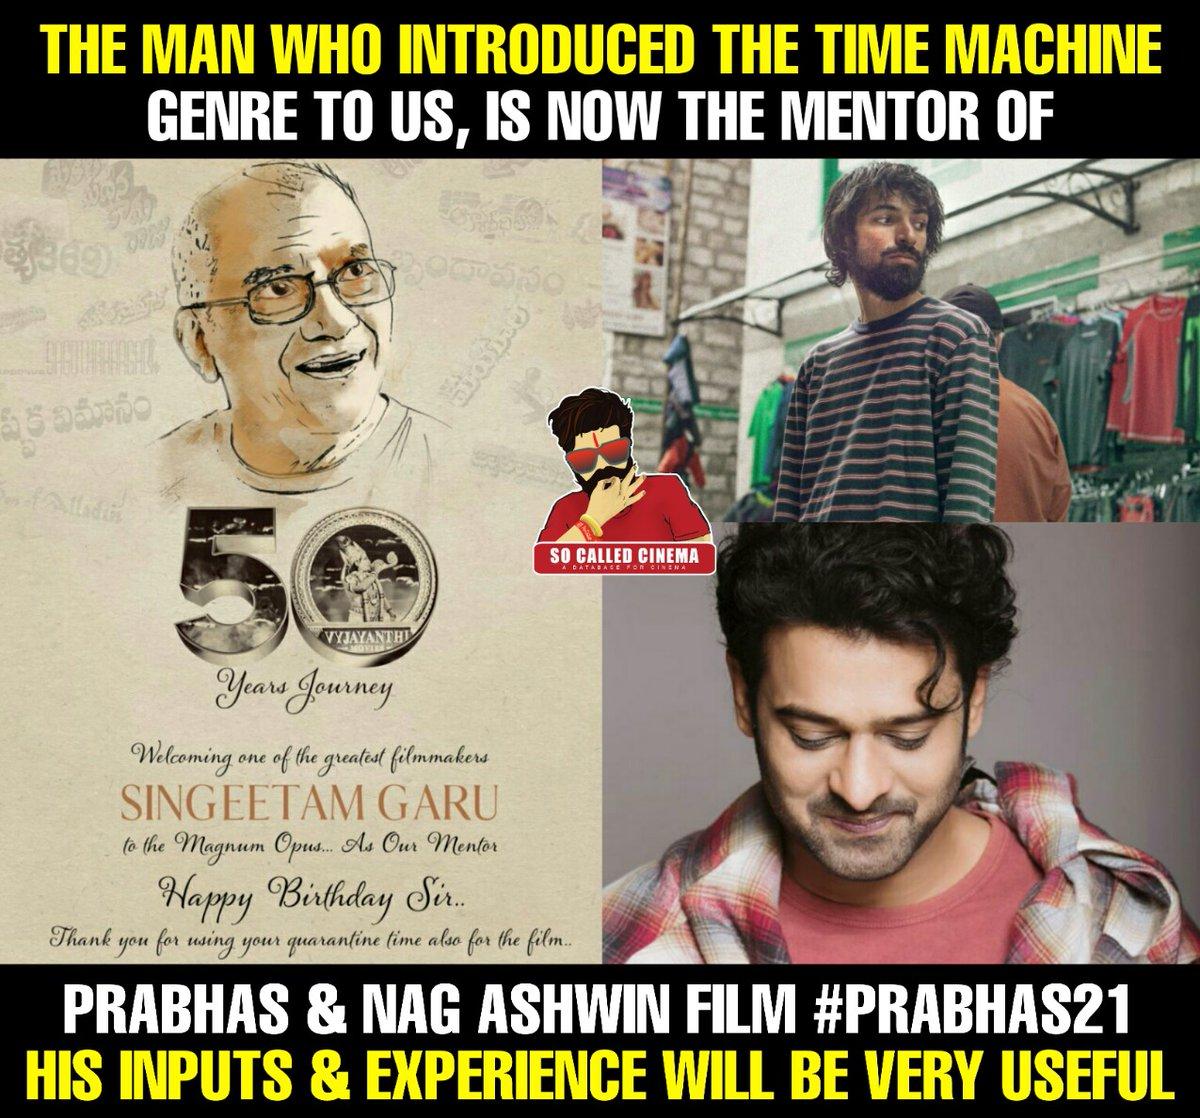 Legendary director #SingeetamSrinivasaRao Garu will be the mentor of Prabhas - Nag Ashwin film..!!  #Prabhas21 #NagAshwin #Prabhas #DeepikaPadukone #SoCalledCinema https://t.co/w9tk73ZHLE